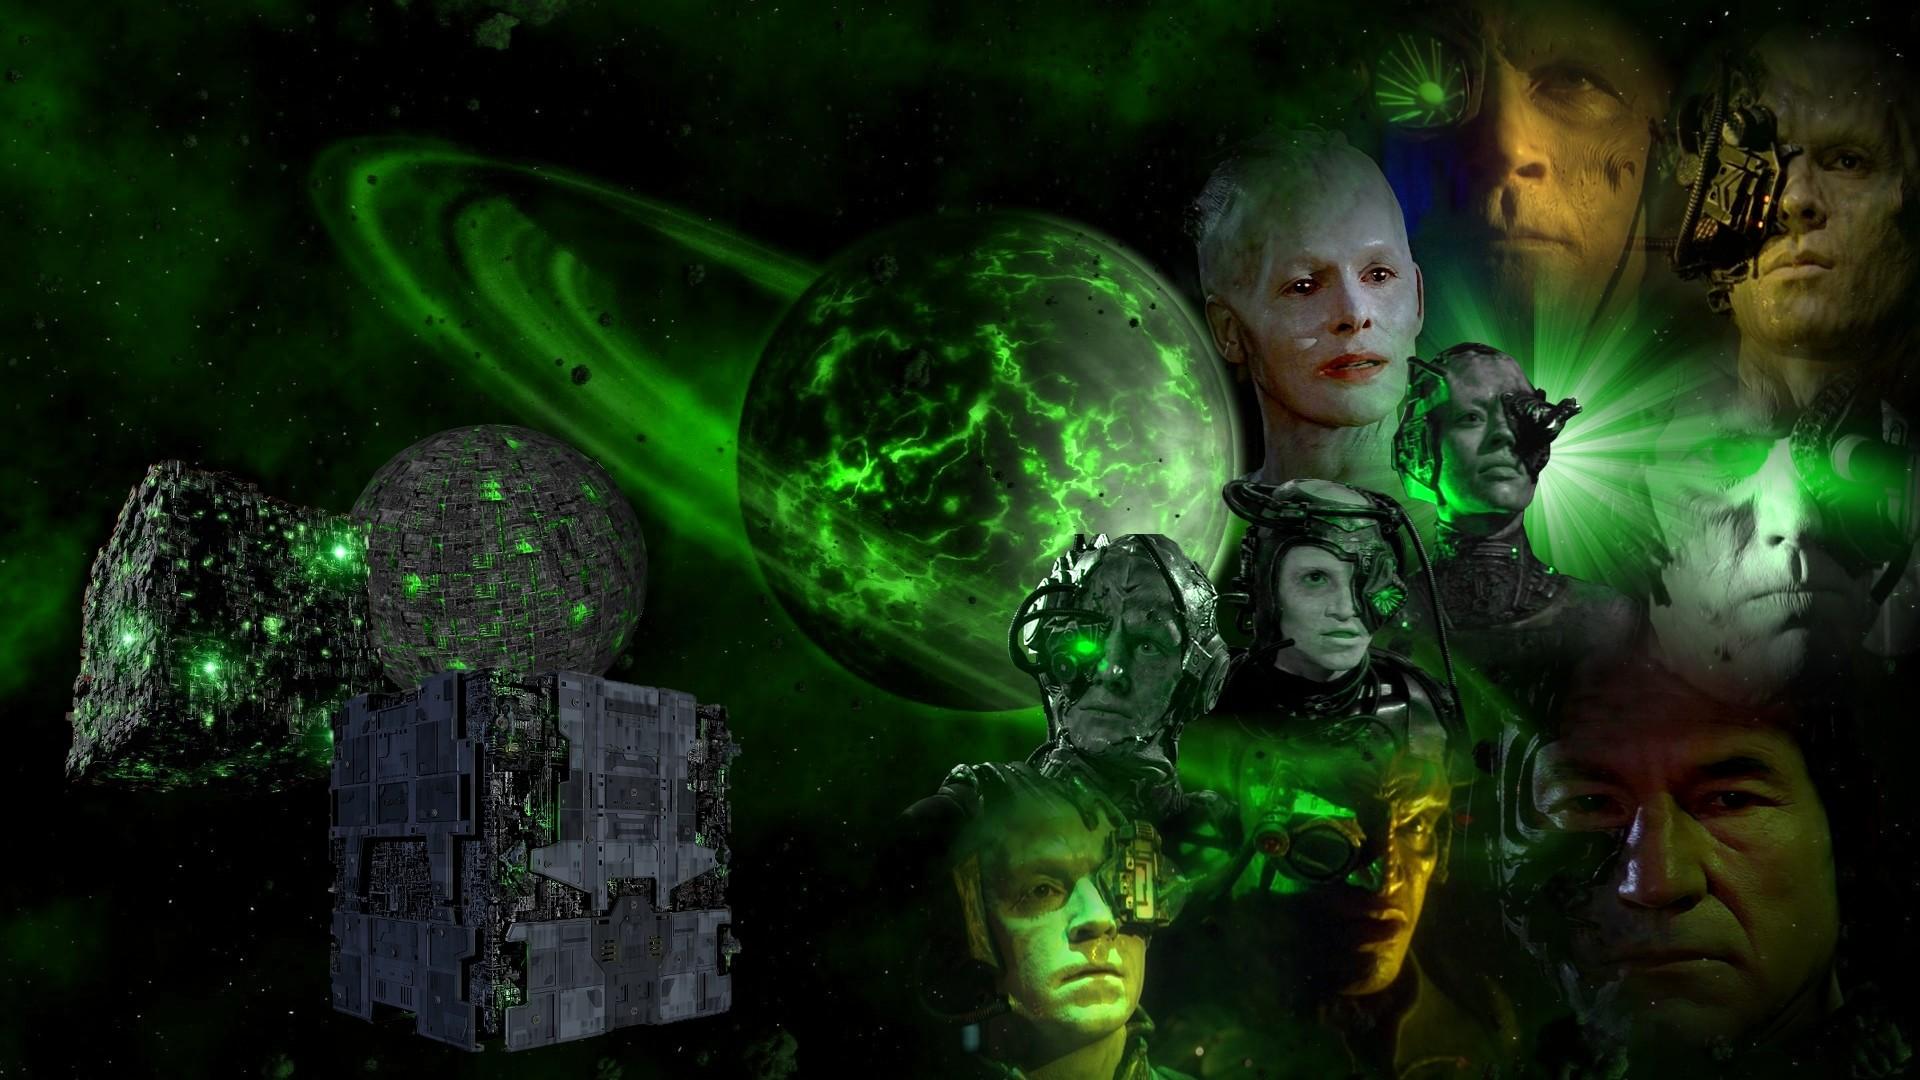 Res: 1920x1080, Borg Wallpaper by LordRadim Borg Wallpaper by LordRadim